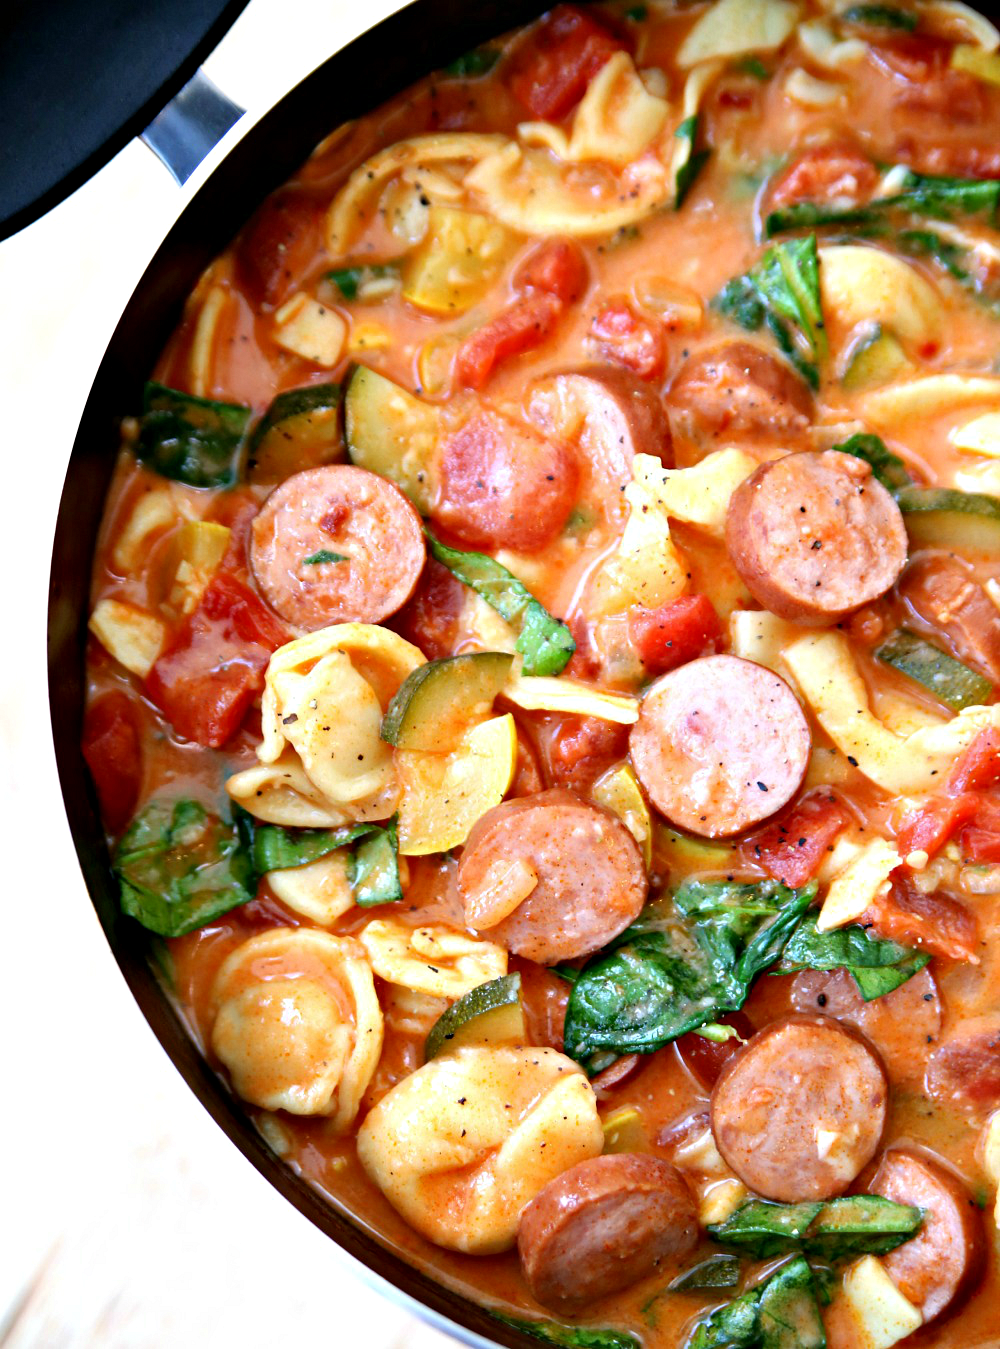 Creamy Smoked Sausage, Tomato, and Tortellini Soup